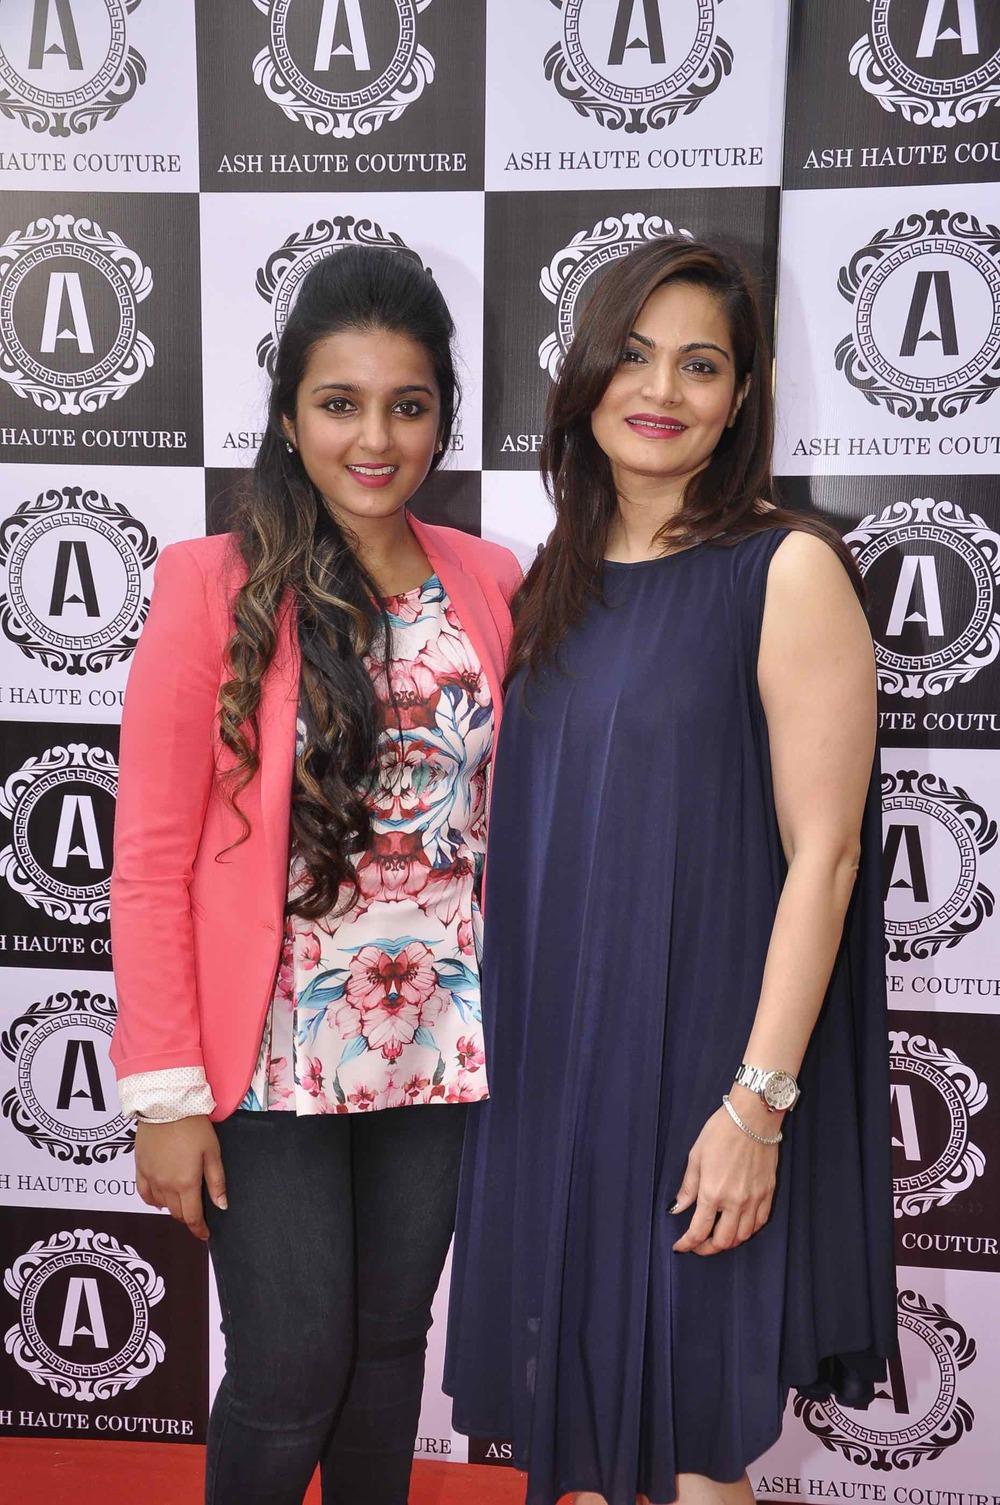 Ashna Gupta Kalra & Alvira Agnihotri